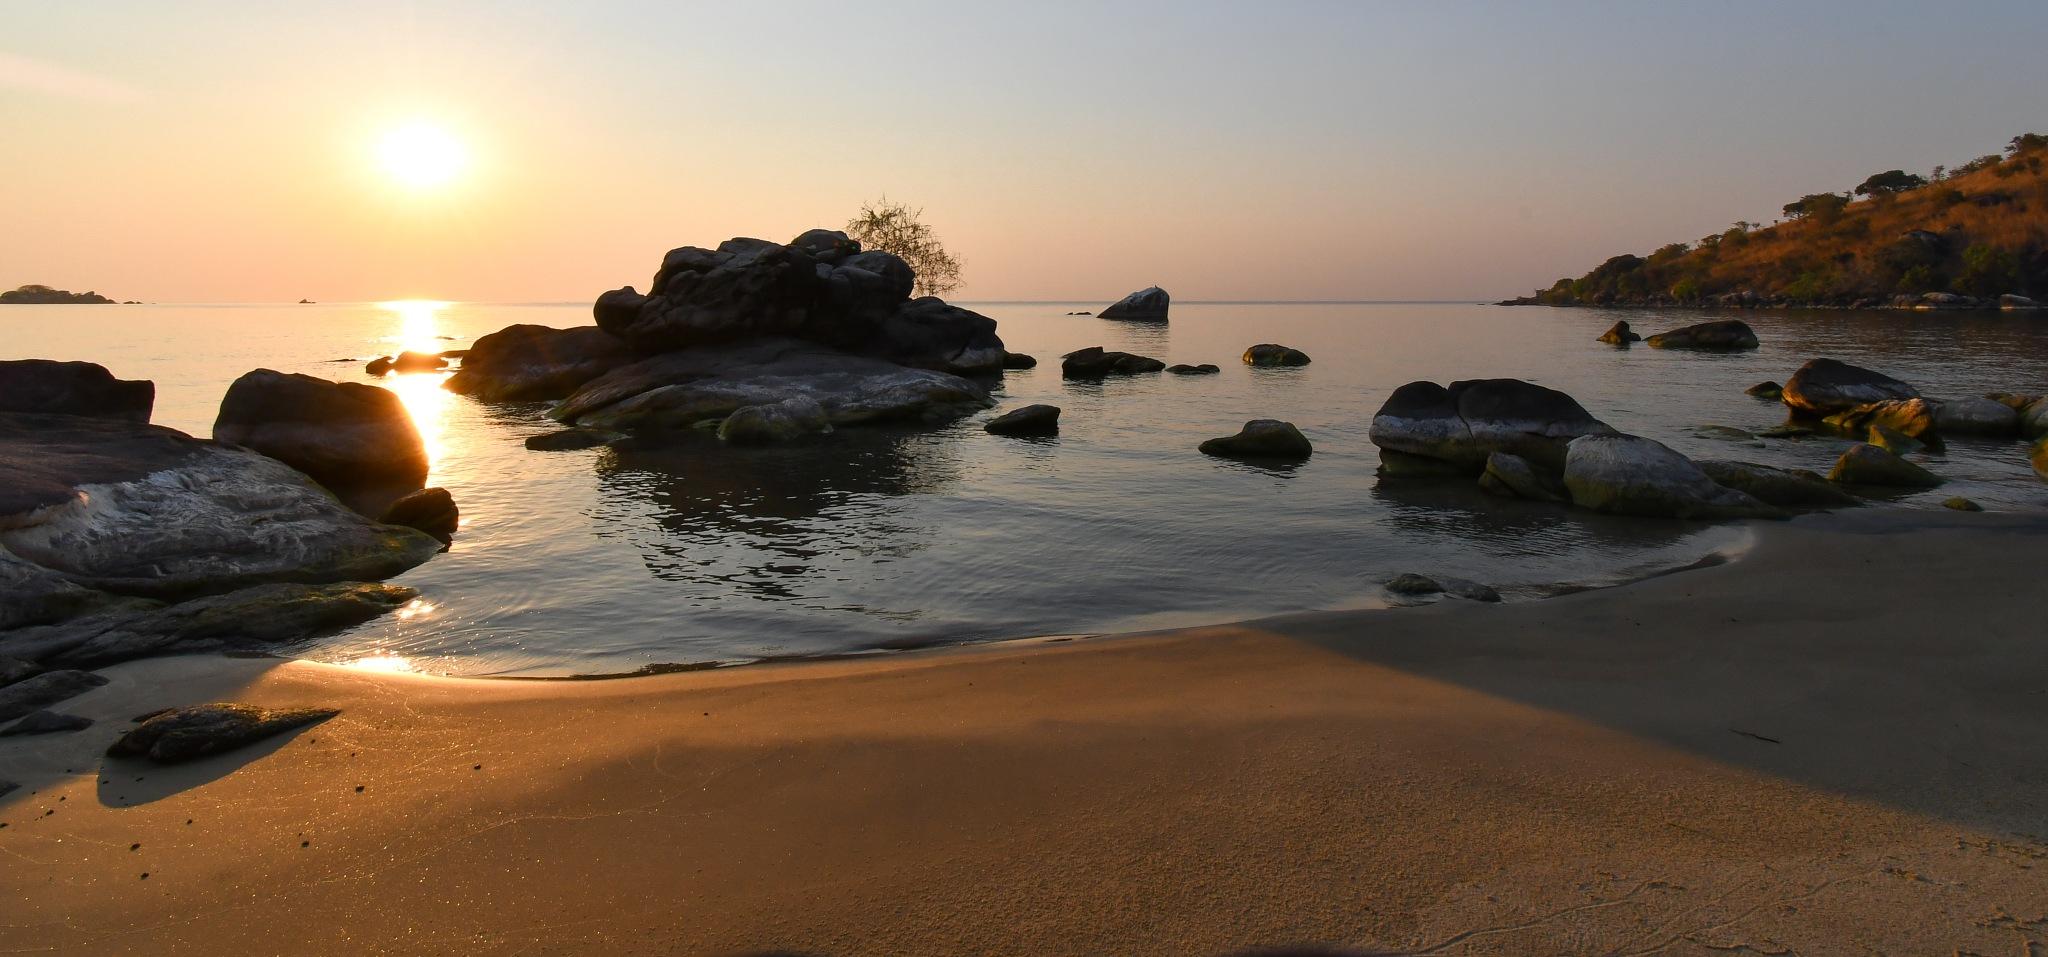 Sunrise over Lake Malawi by Peter Schuppli